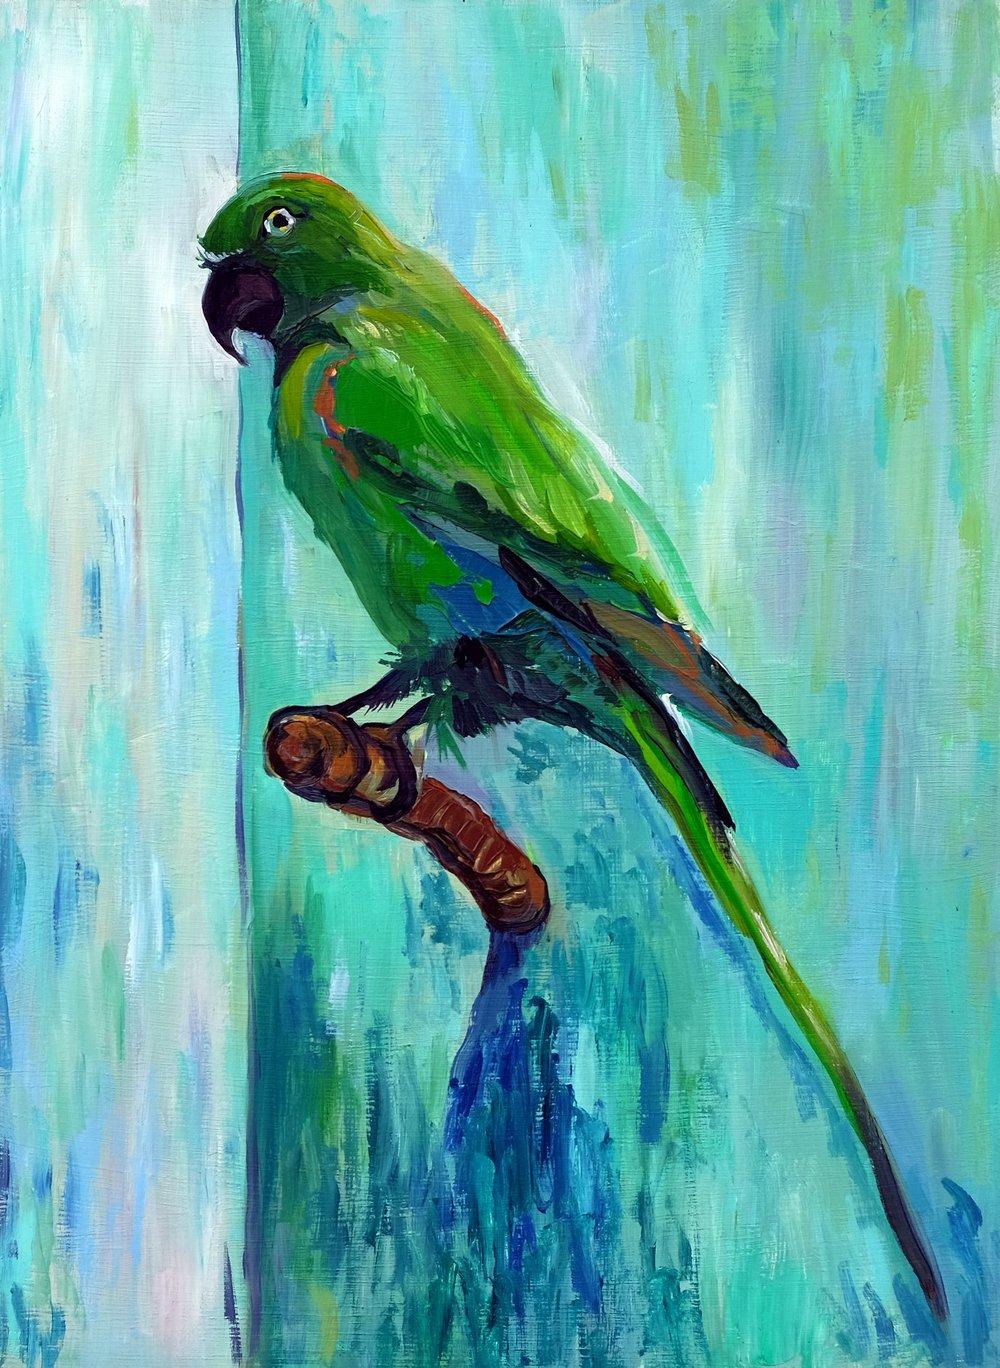 'The Parakeet (Grumpy)'